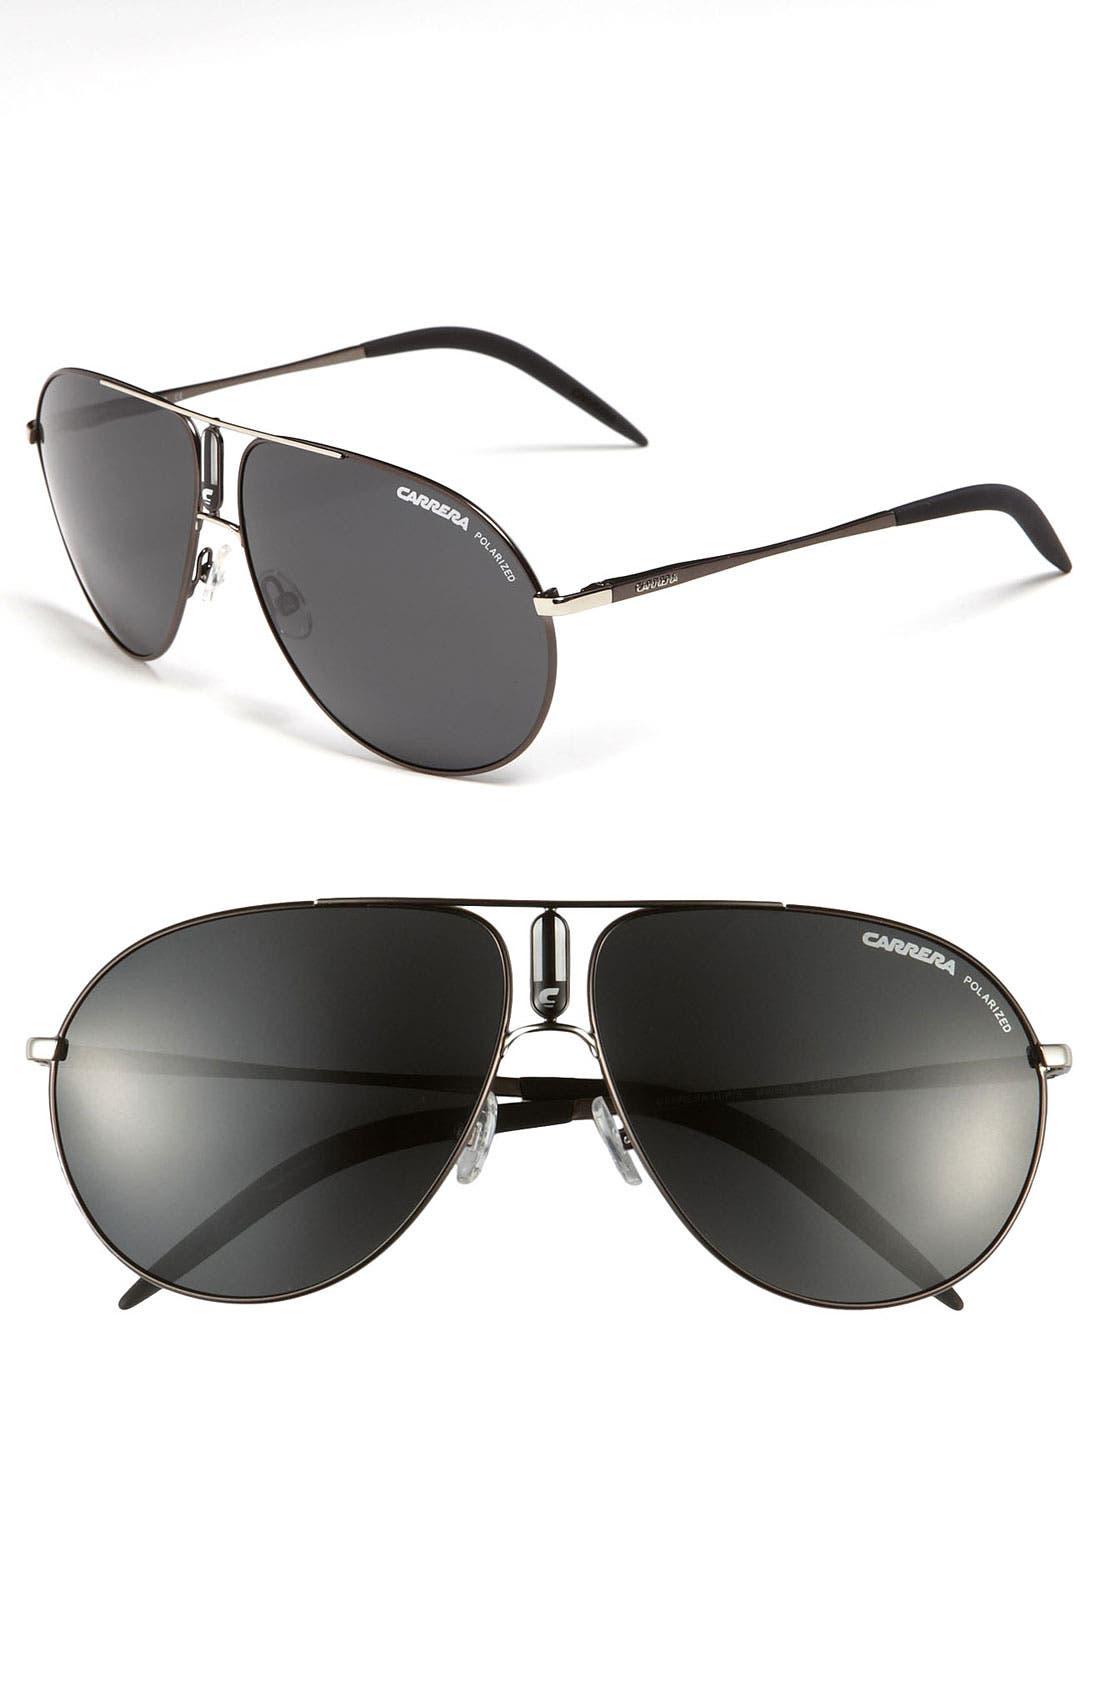 Main Image - Carrera Eyewear 61mm Polarized Aviator Sunglasses